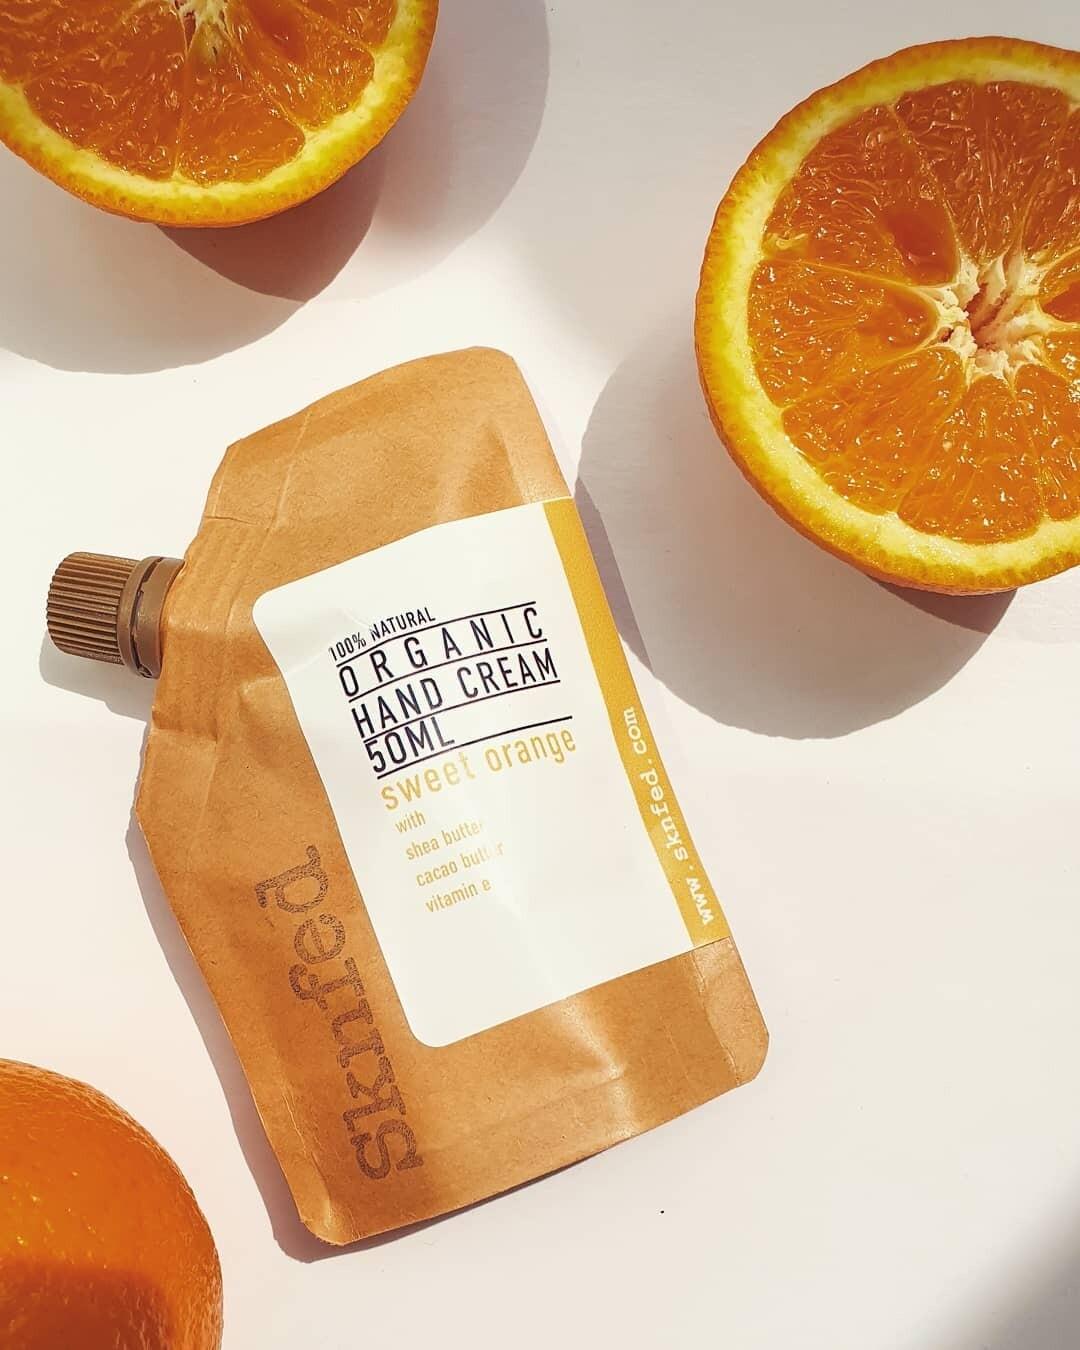 Sknfed Organic Hand Cream - Sweet Orange, 50ml